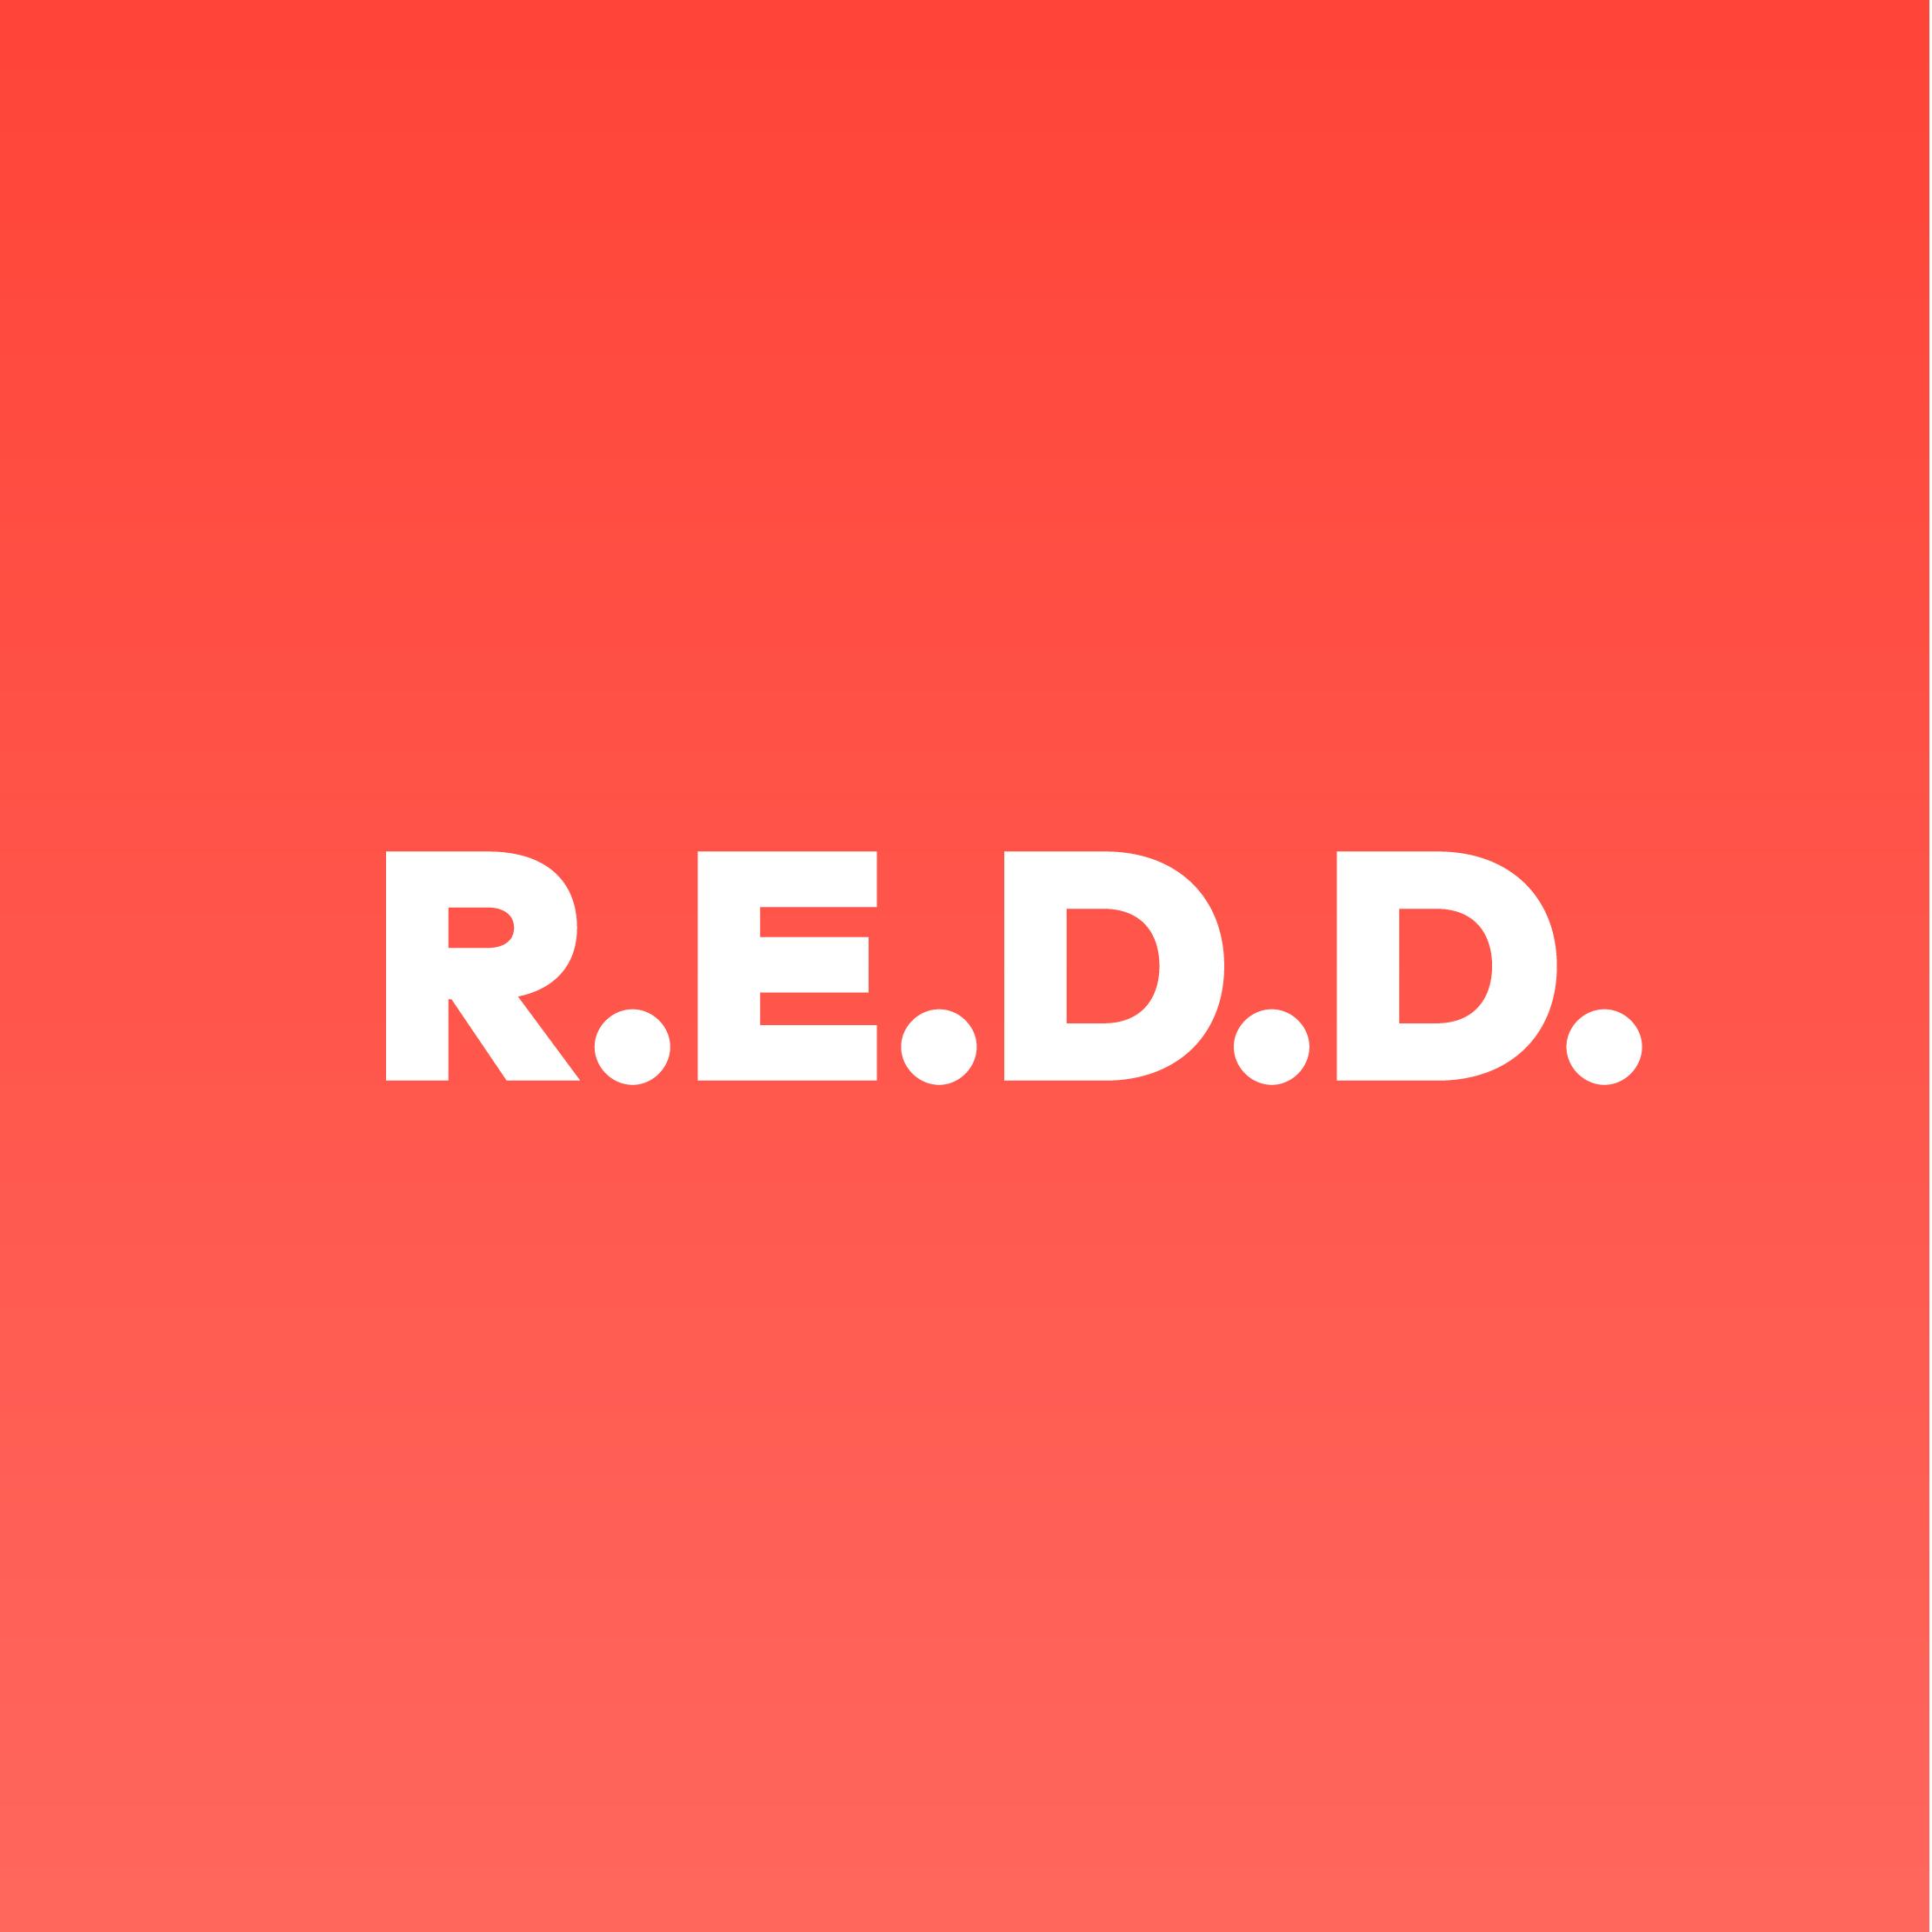 2222 redd gradient